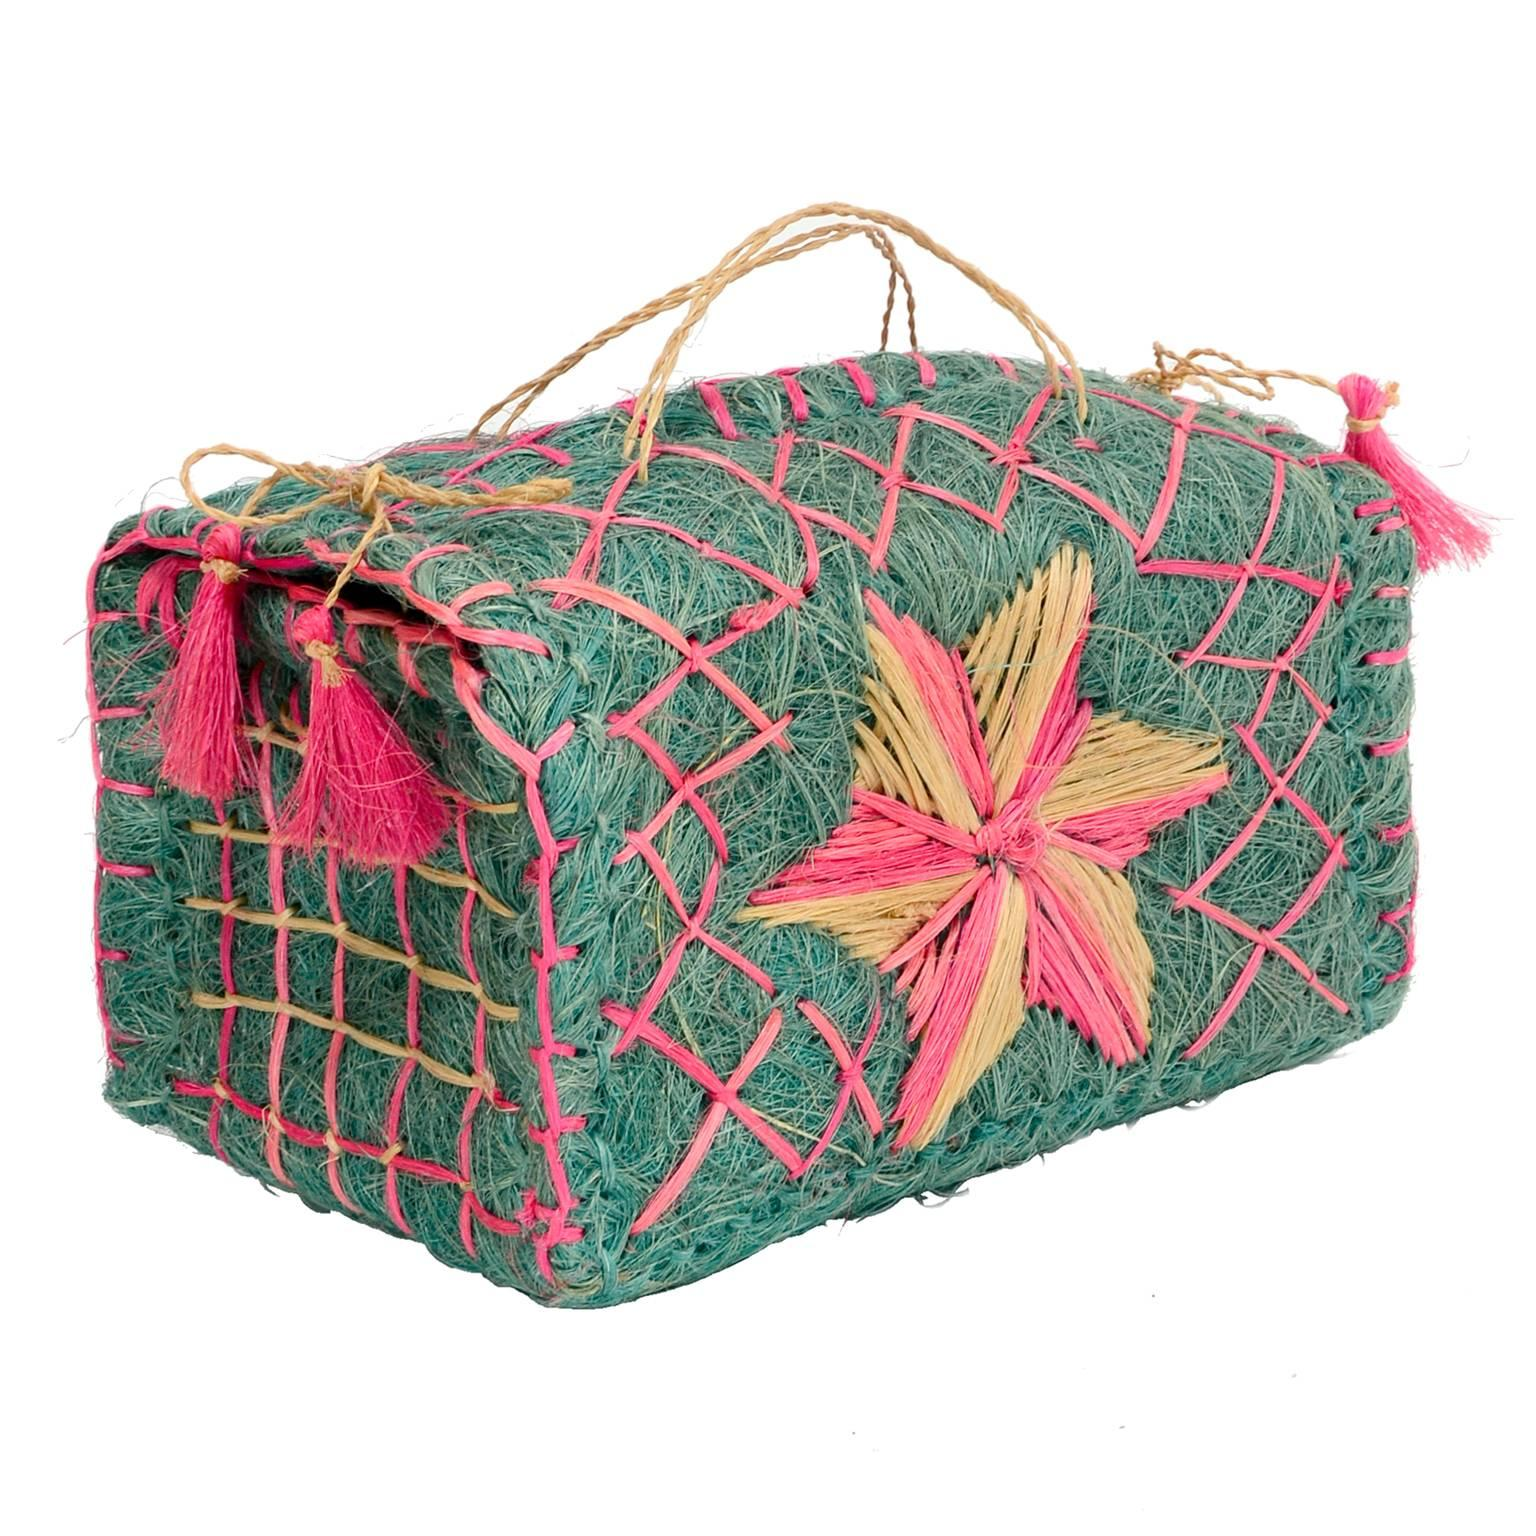 1stdibs Vintage Straw & Raffia Pink & Green Box Style Handbag W/ Pink Tassels GIYtGR